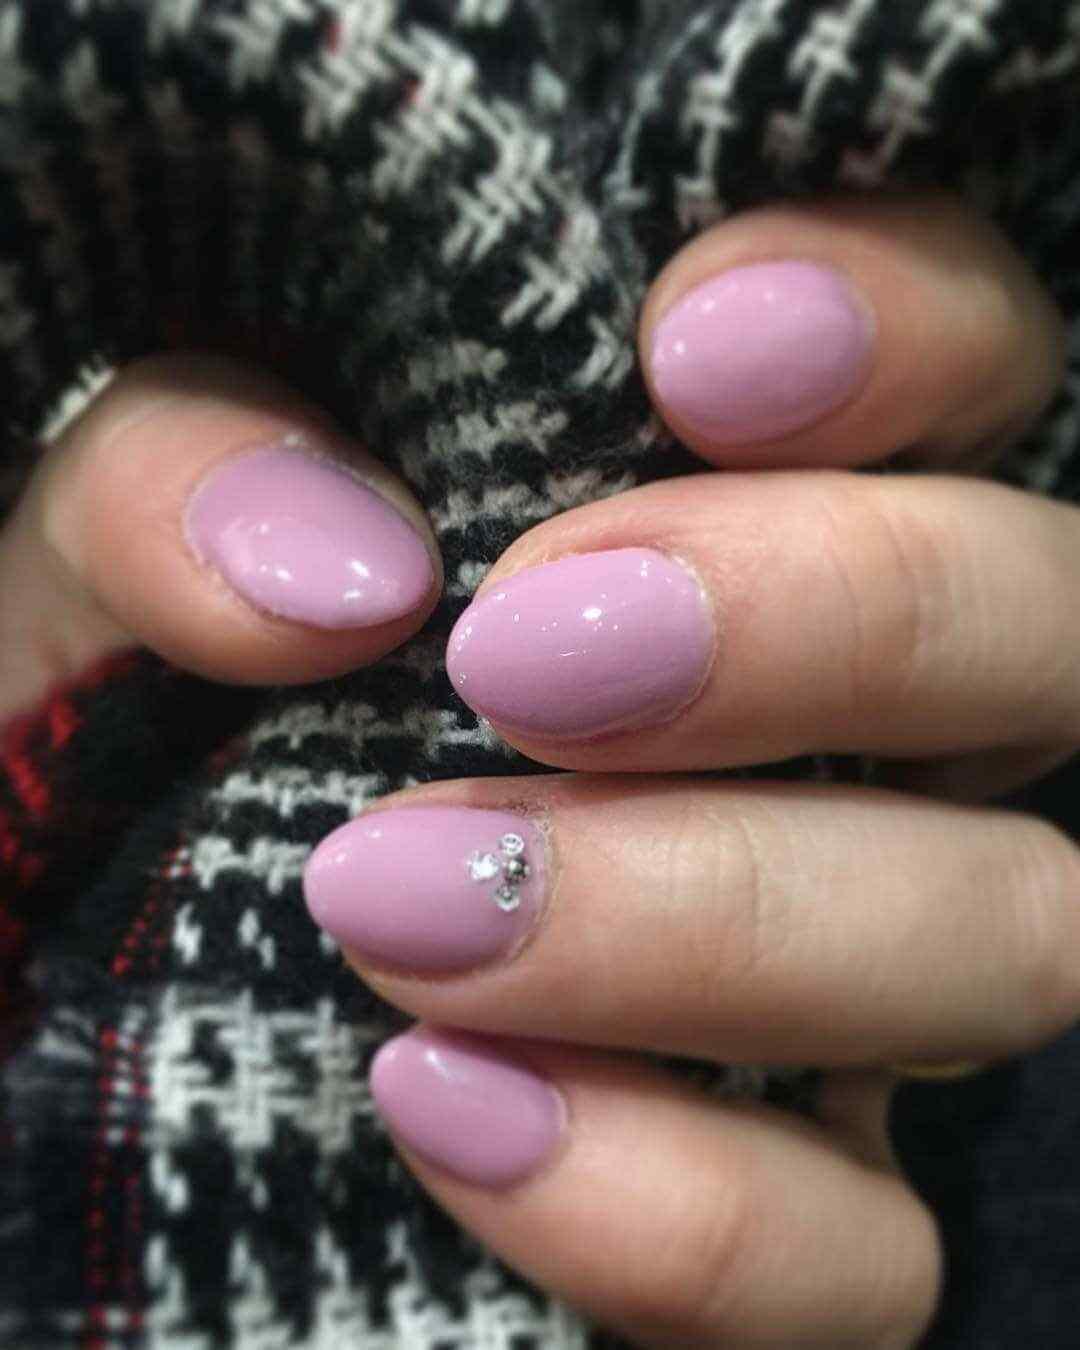 modelos de uñas cortas rosa viejo